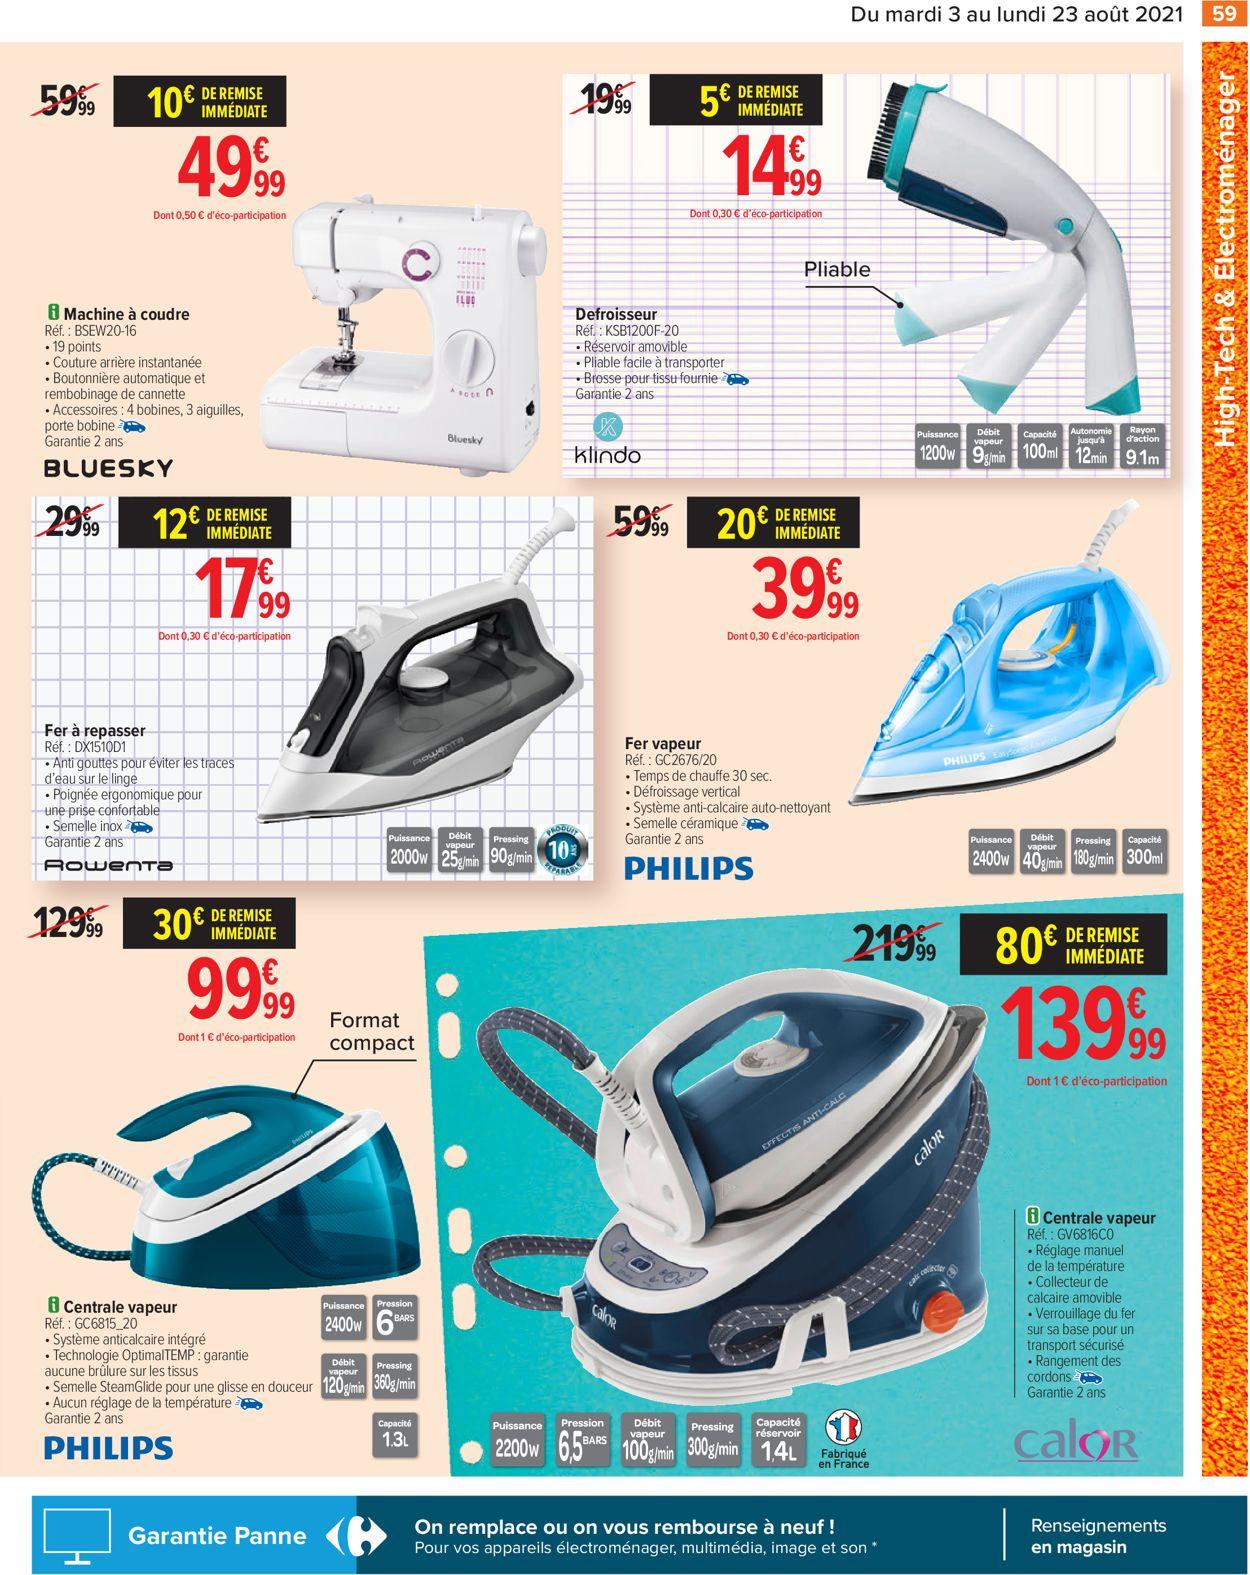 Carrefour Catalogue - 03.08-23.08.2021 (Page 59)